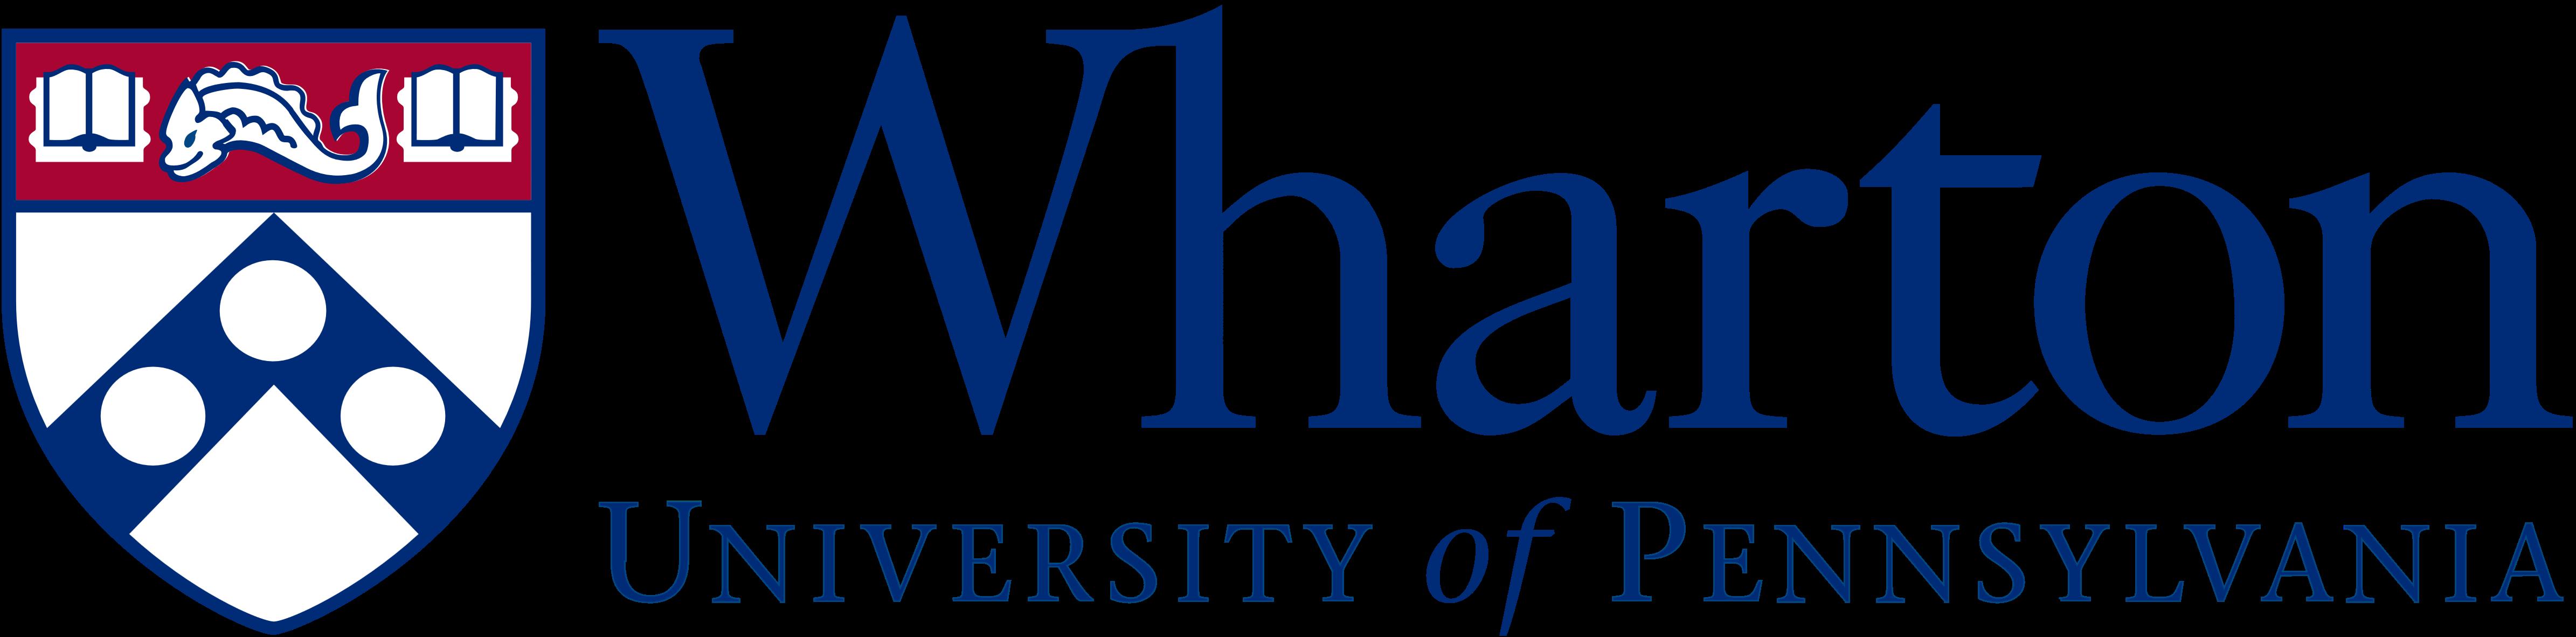 University-of-Pennsylvania-Wharton-School-of-Business-logo